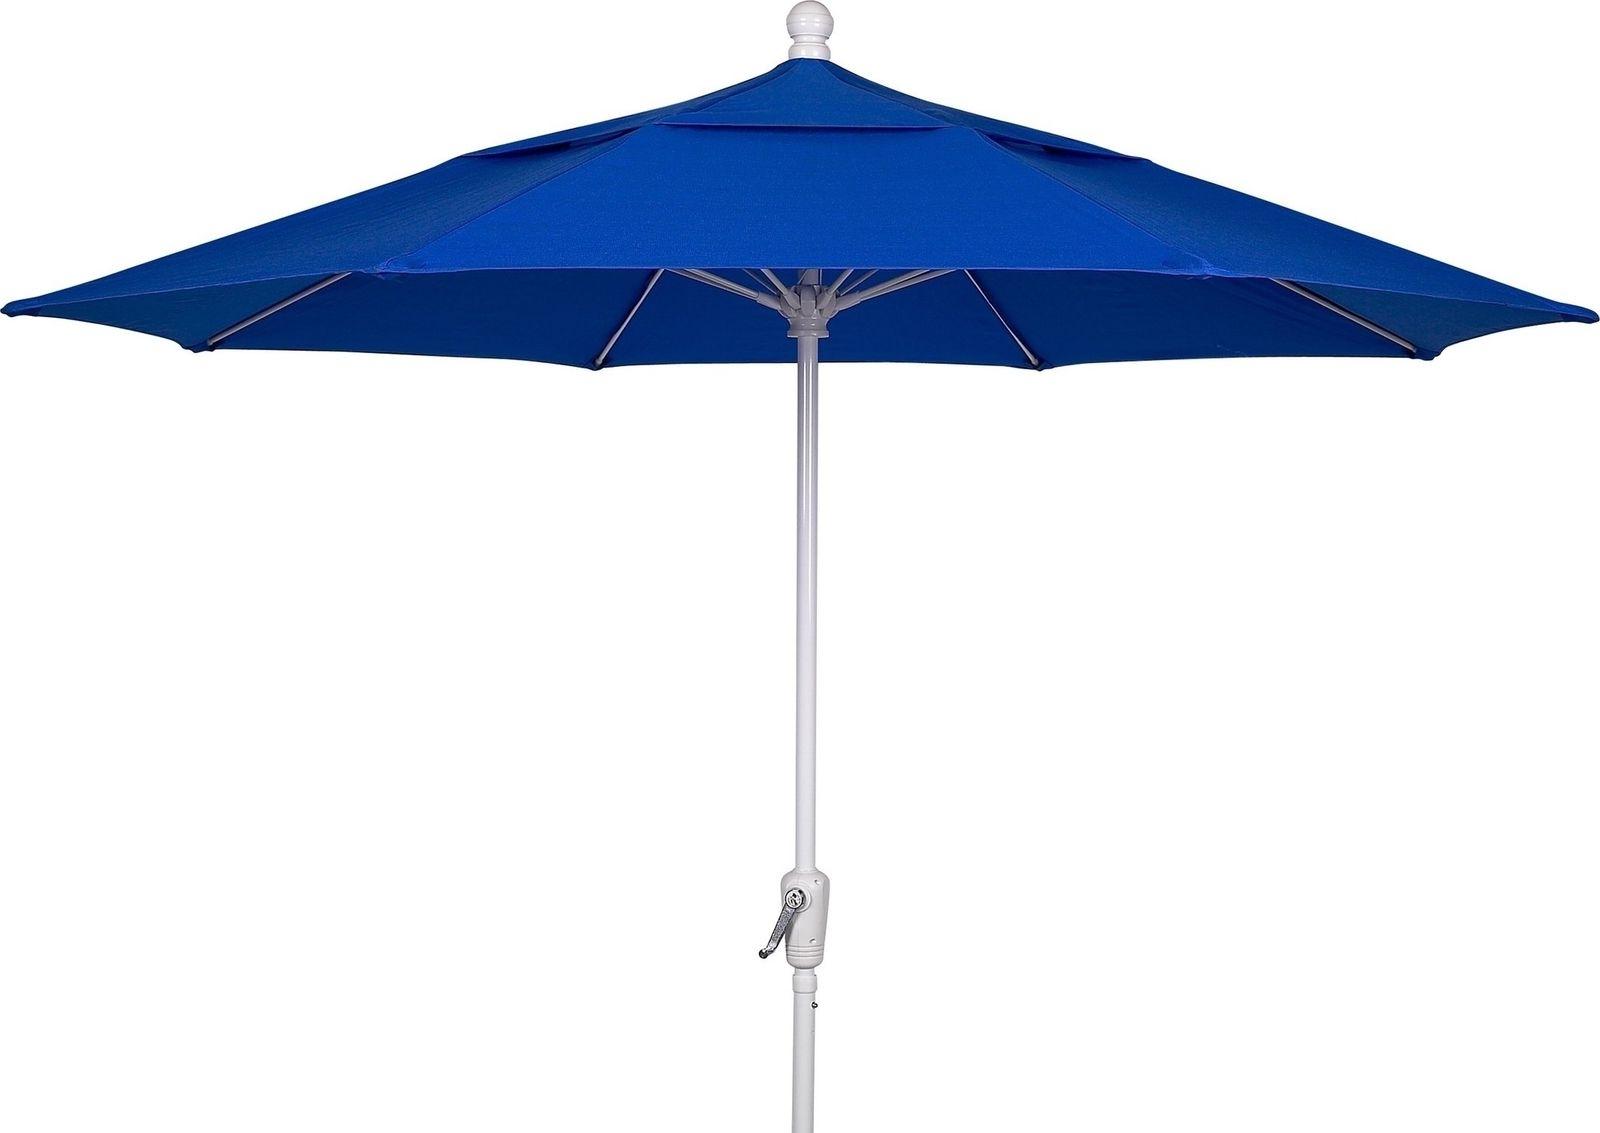 Fiberbuilt Umbrellas Patio Umbrella (View 3 of 20)